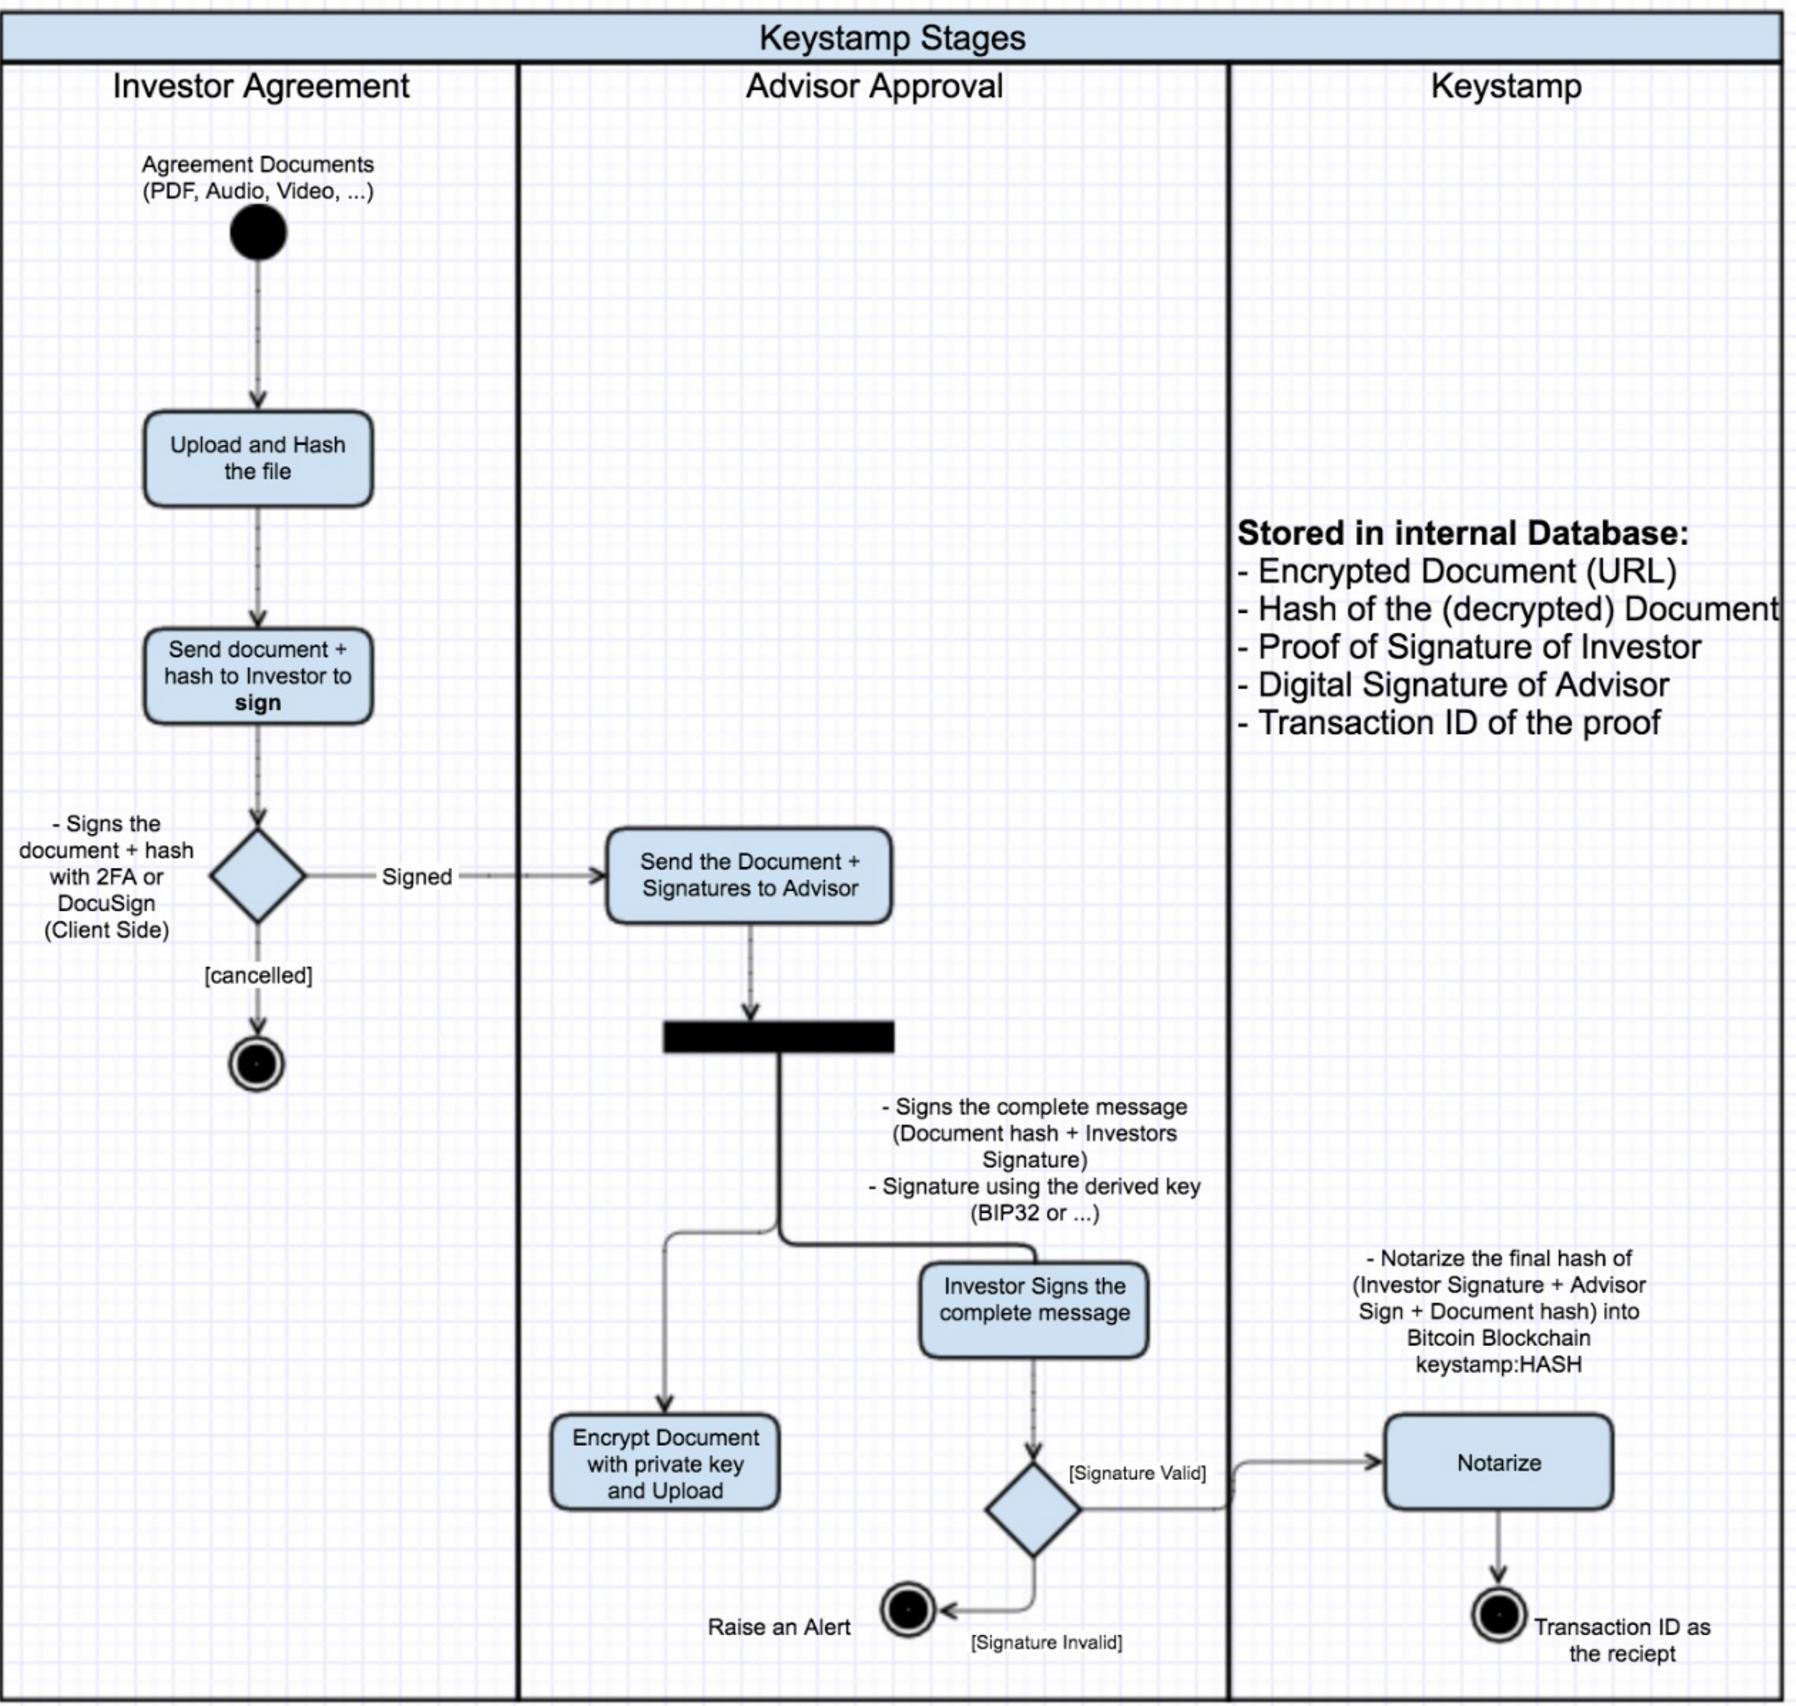 Keystamp process